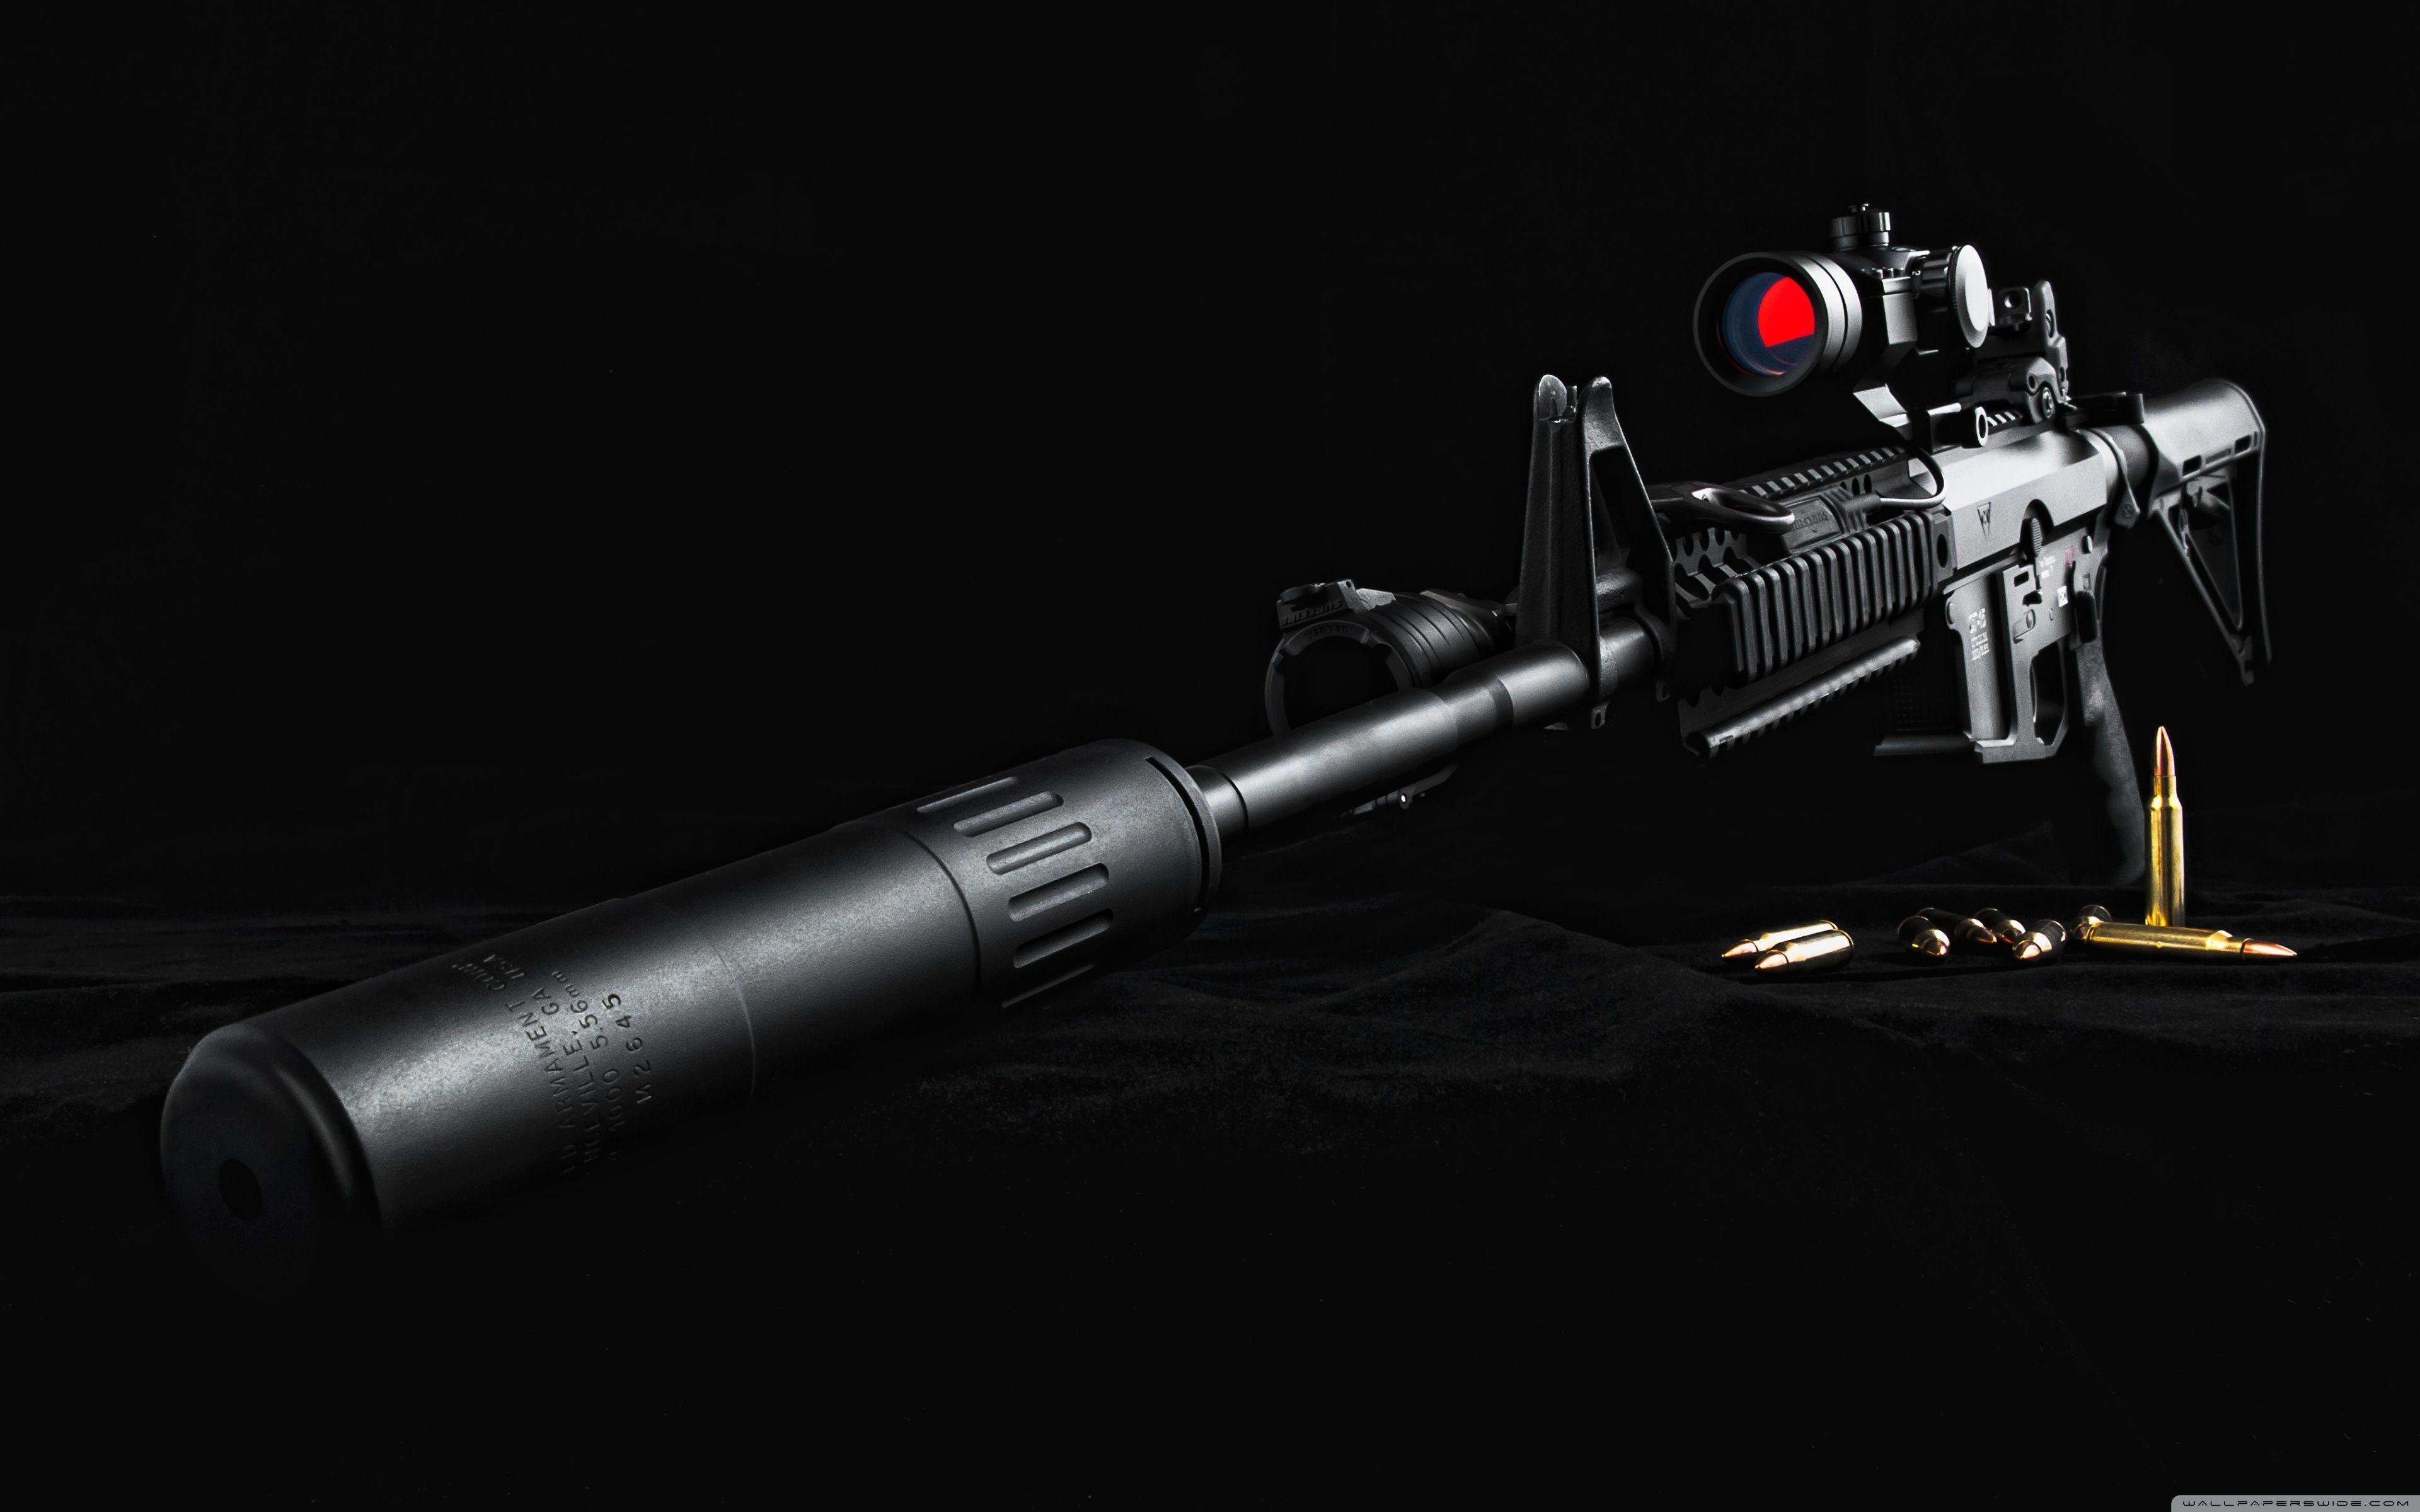 Sniper 4k Ultra Hd Dark Wallpapers Top Free Sniper 4k